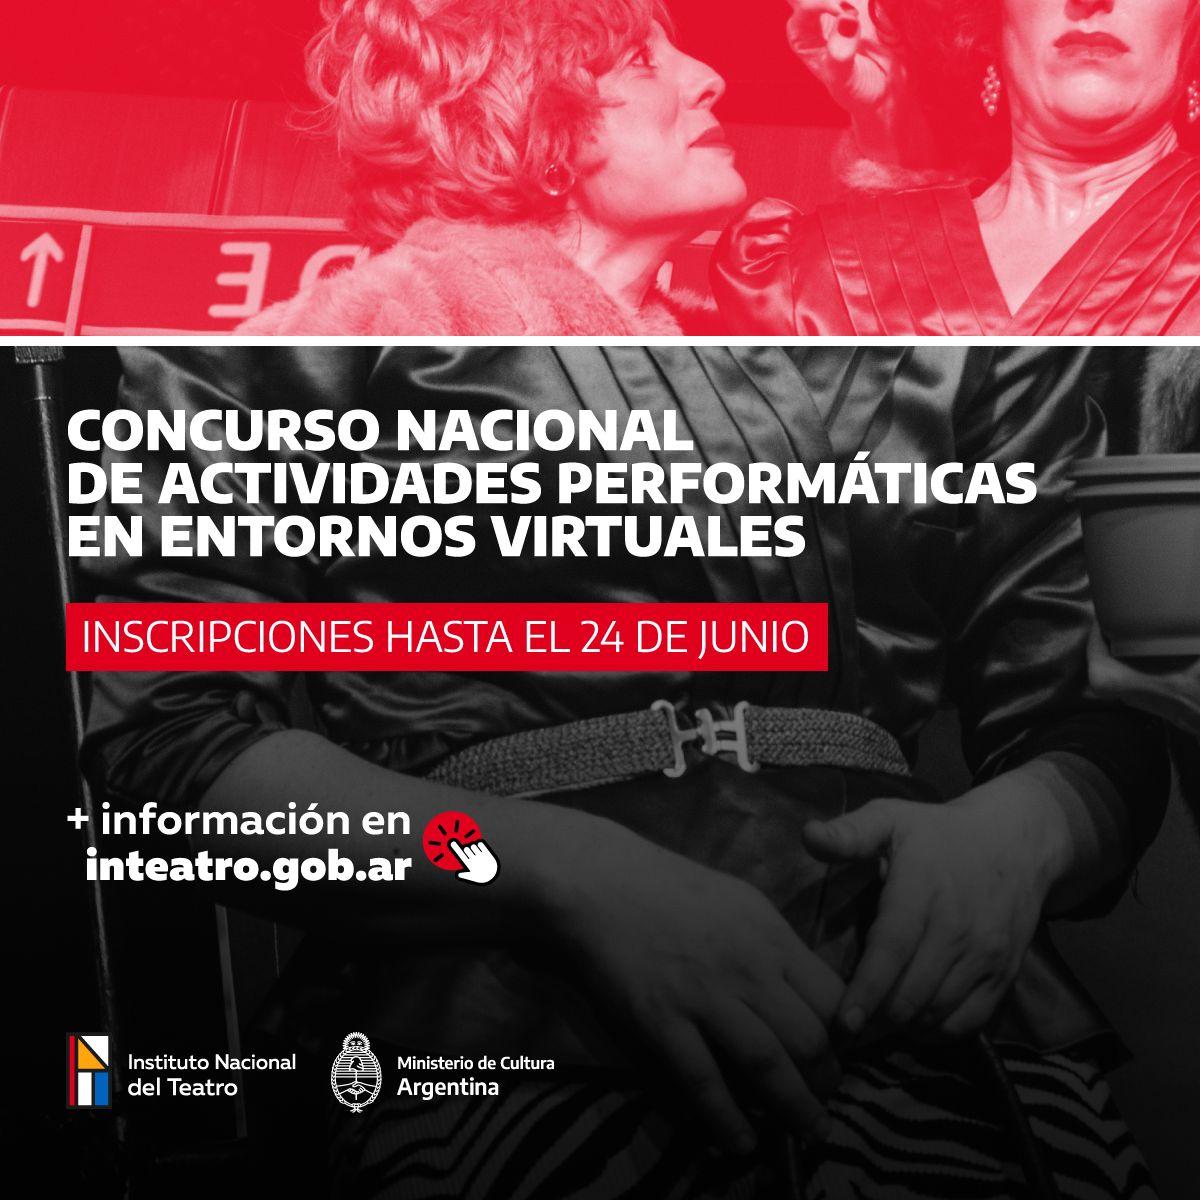 Concurso nacional de actividades Performáticas en entornos virtuales